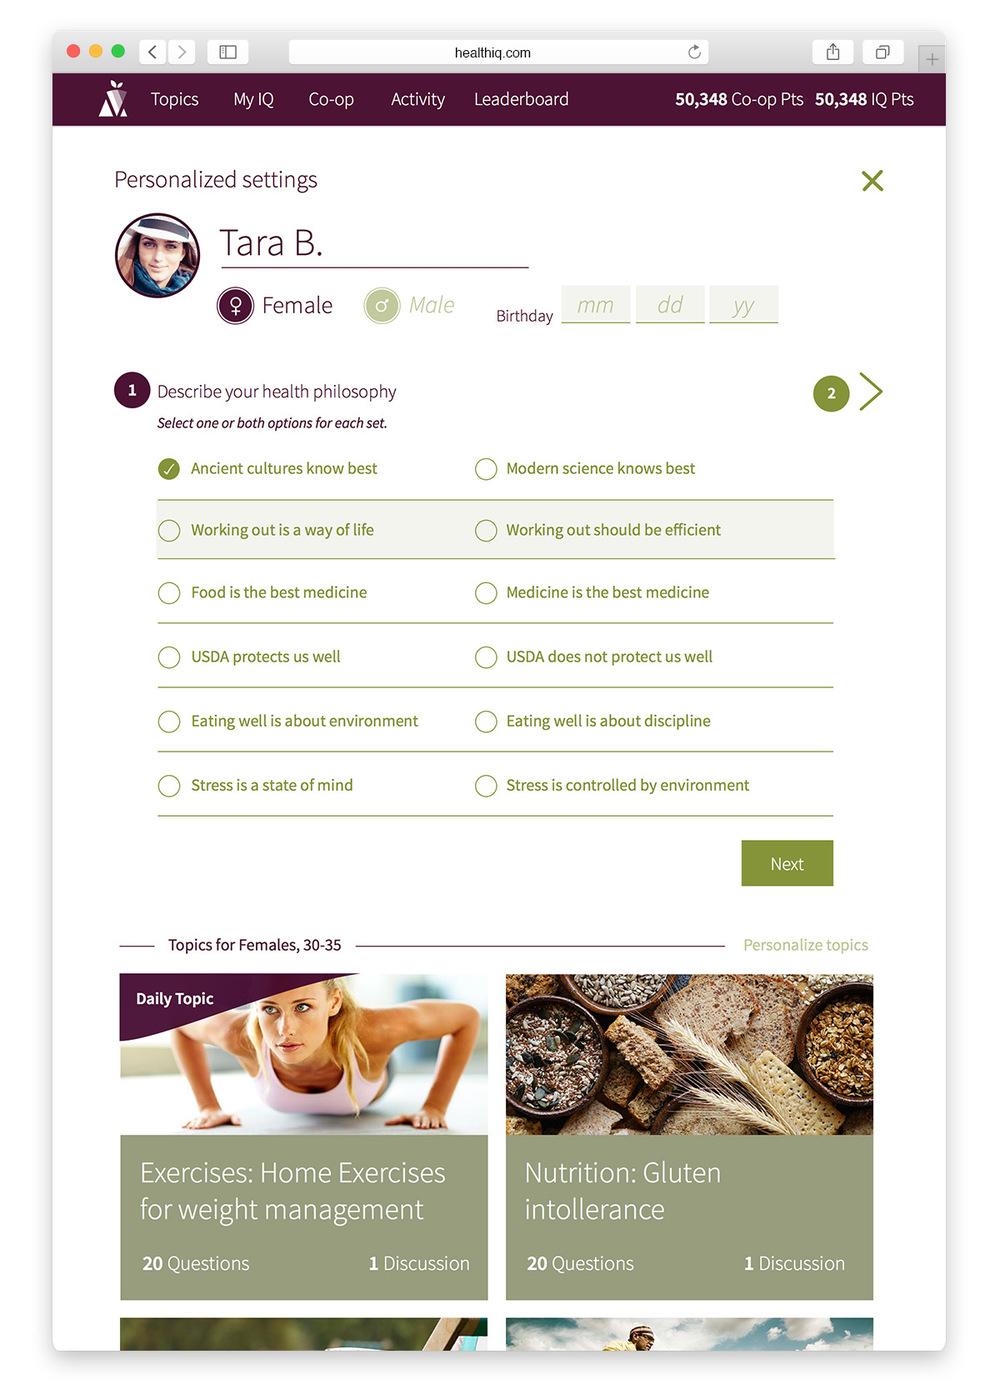 hiq-web-app-07.jpg